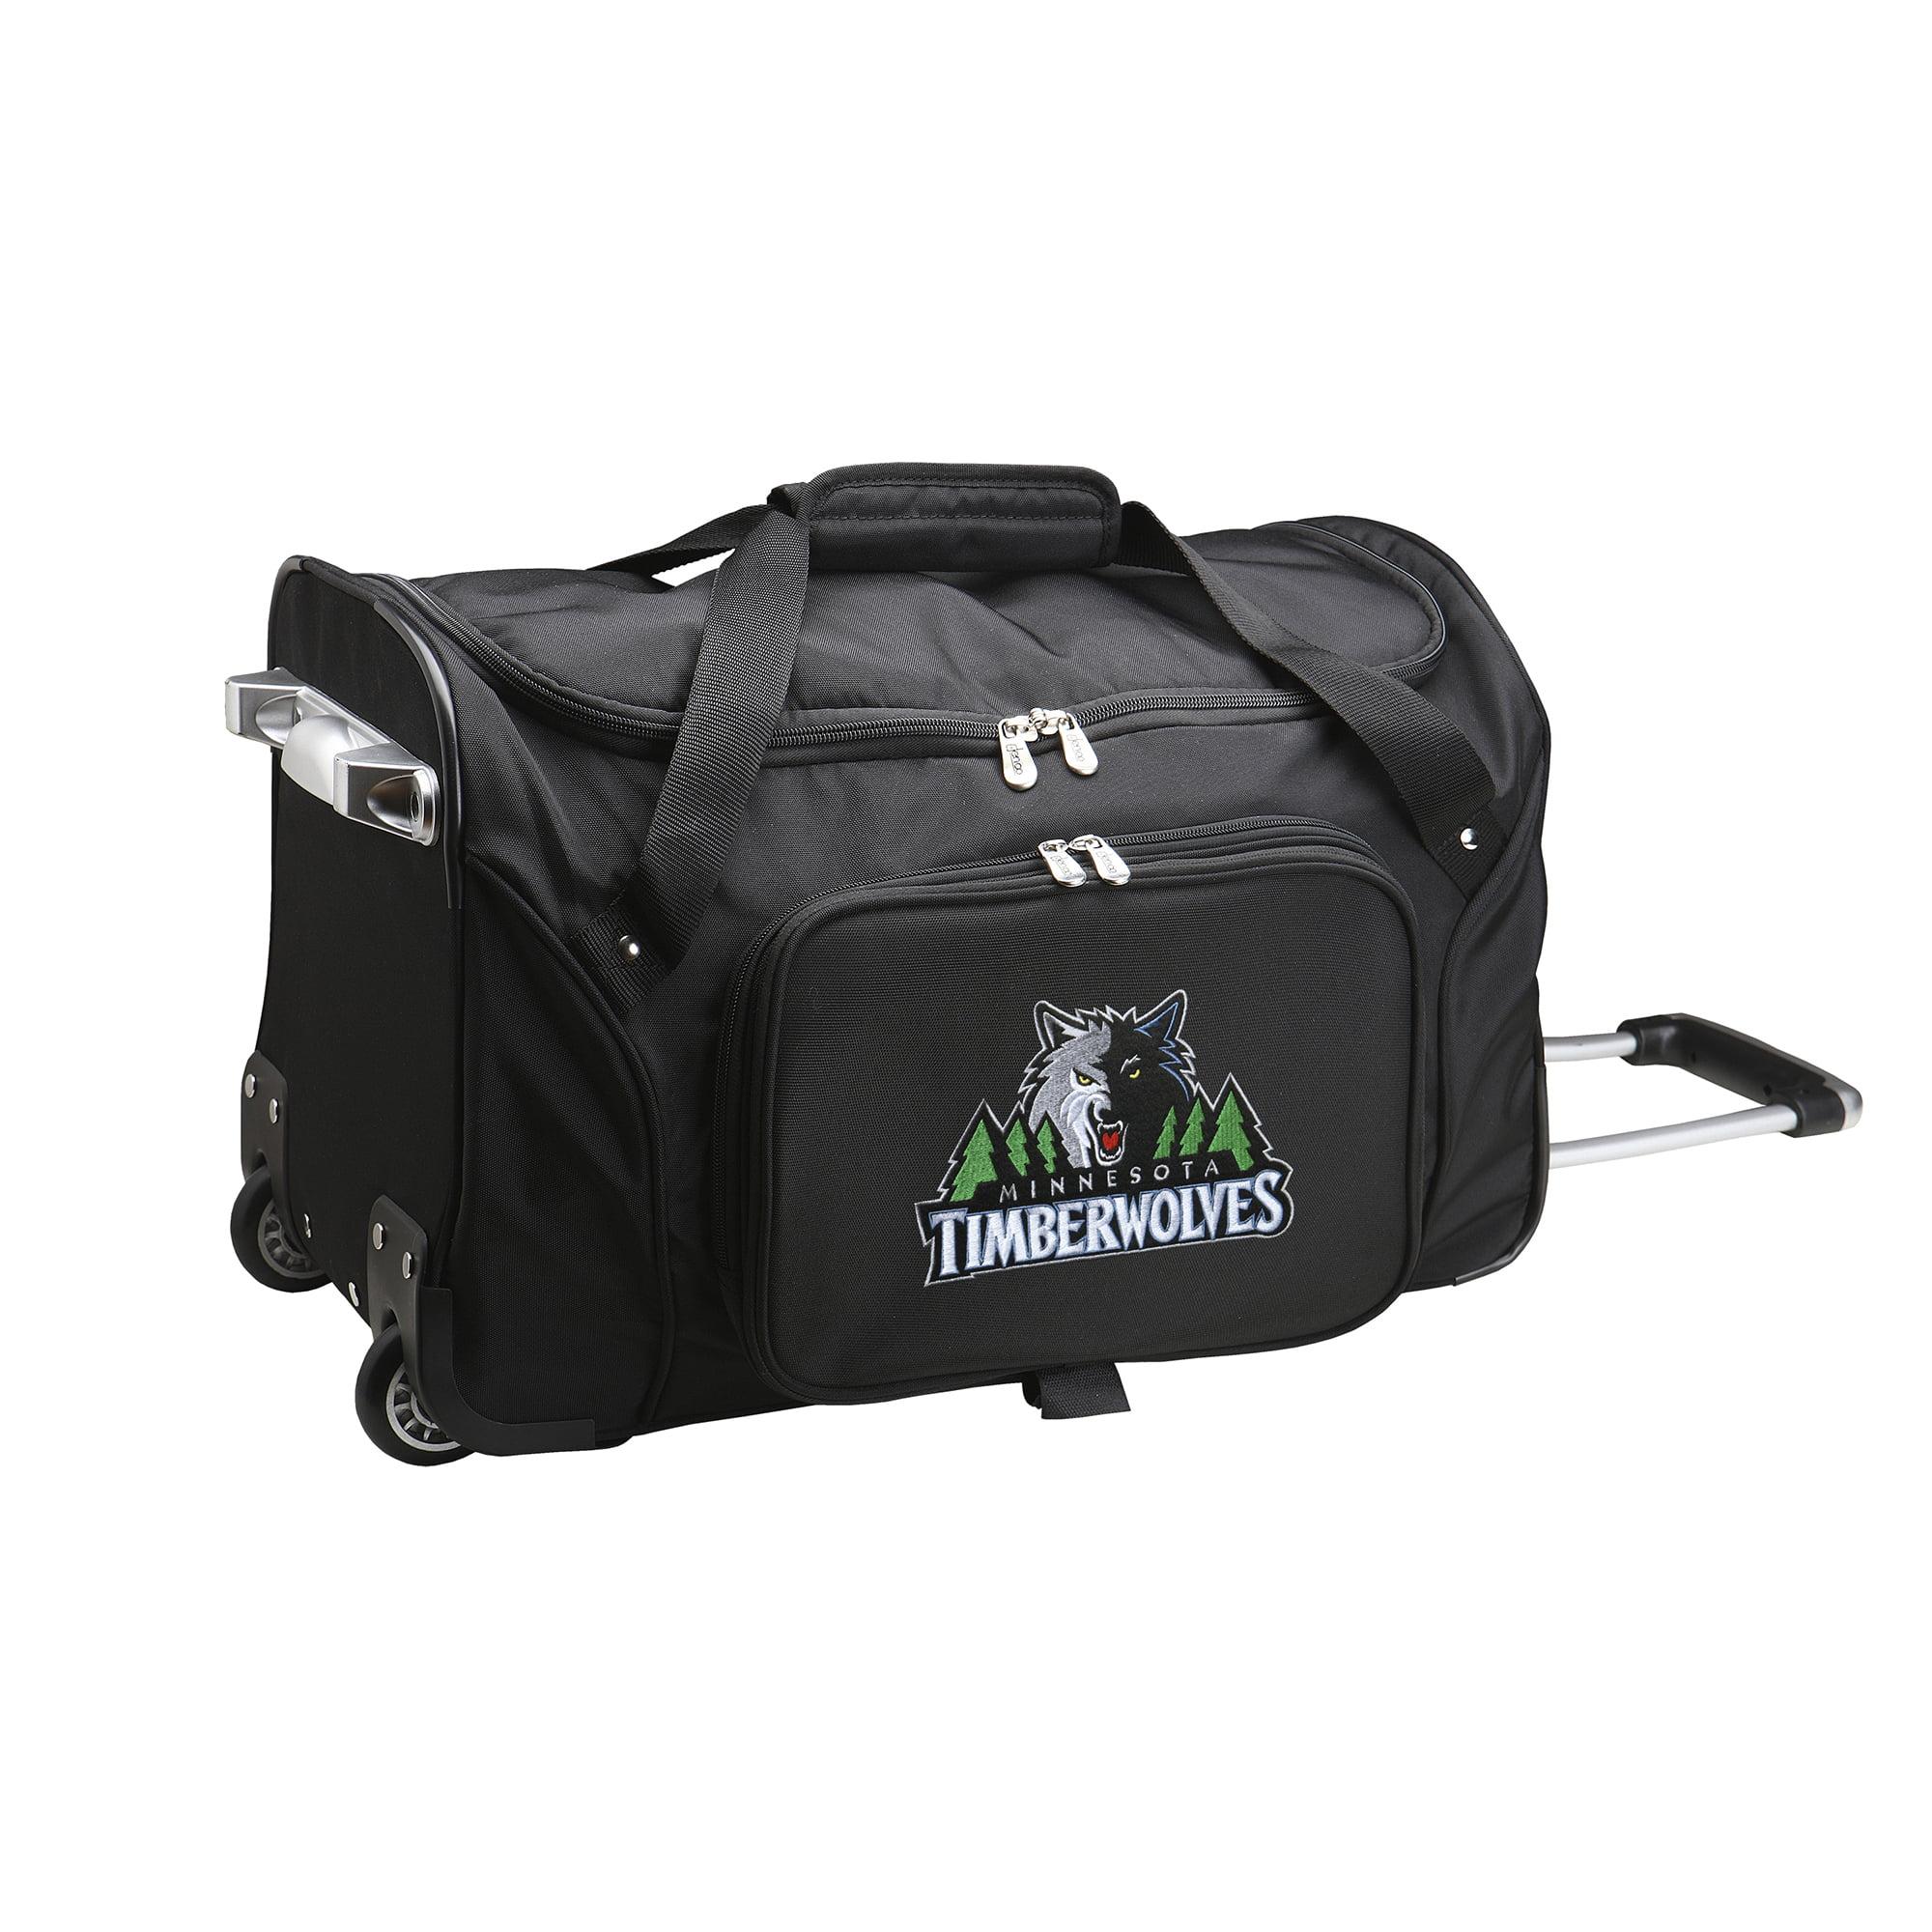 "Minnesota Timberwolves 22"" 2-Wheeled Duffel Bag - Black - No Size"